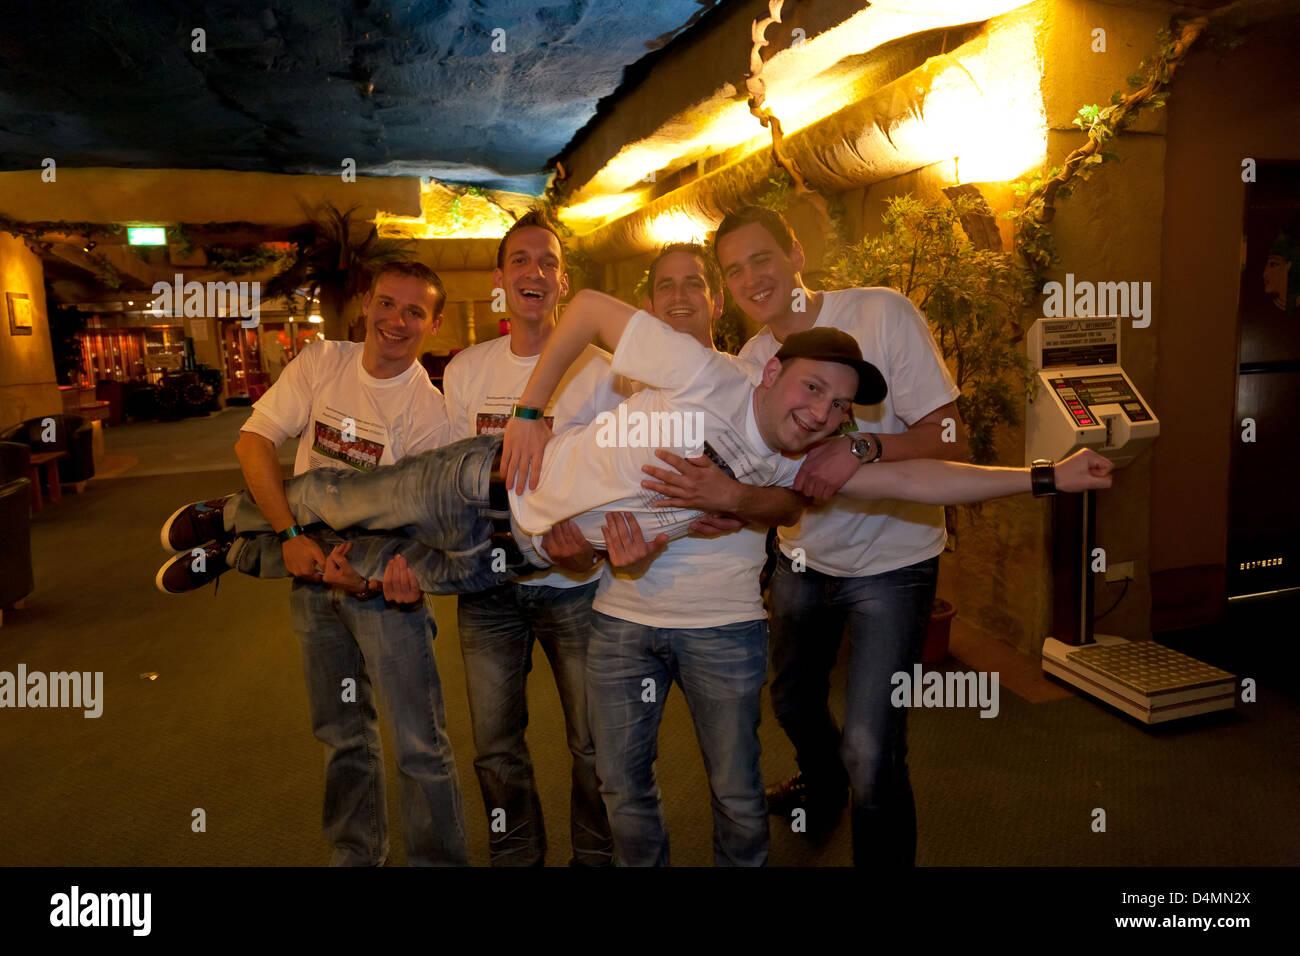 Kalkar, Germany, young people at a sports club in Kalkar - Stock Image